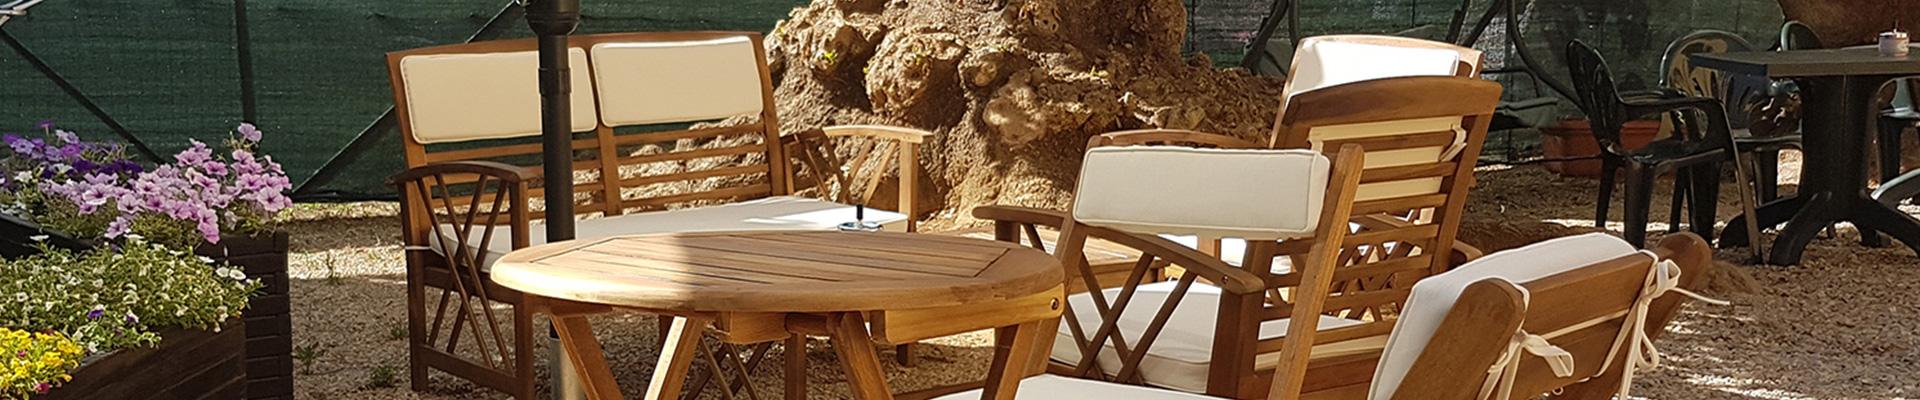 Bed & Breakfast Pintadera - Alghero - Gli esterni